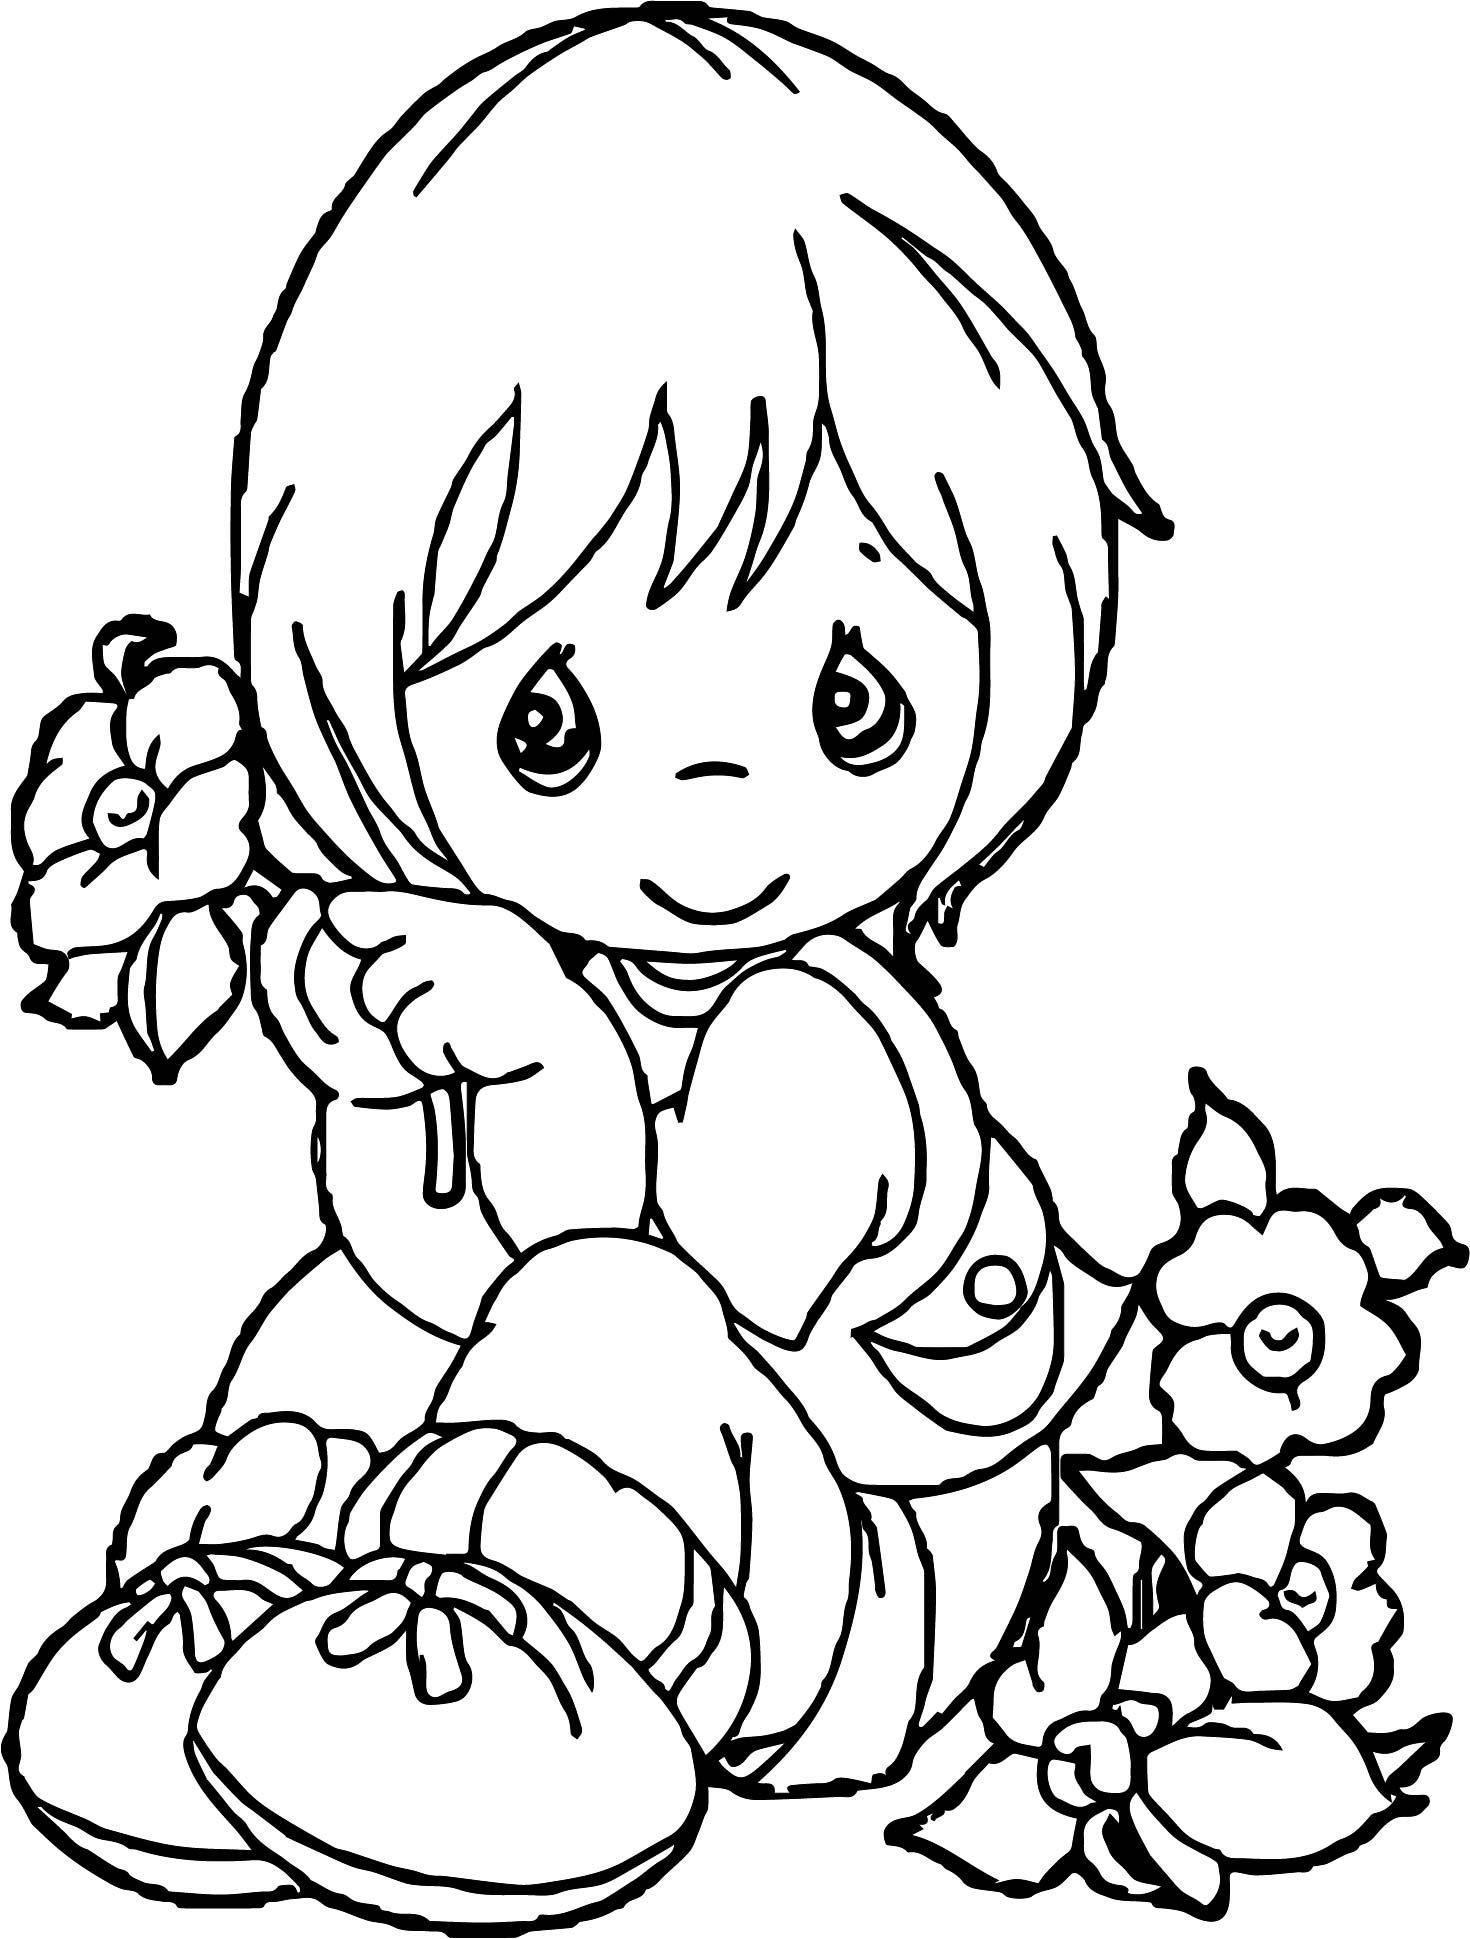 malvorlagen baby girl  Coloring and Malvorlagan